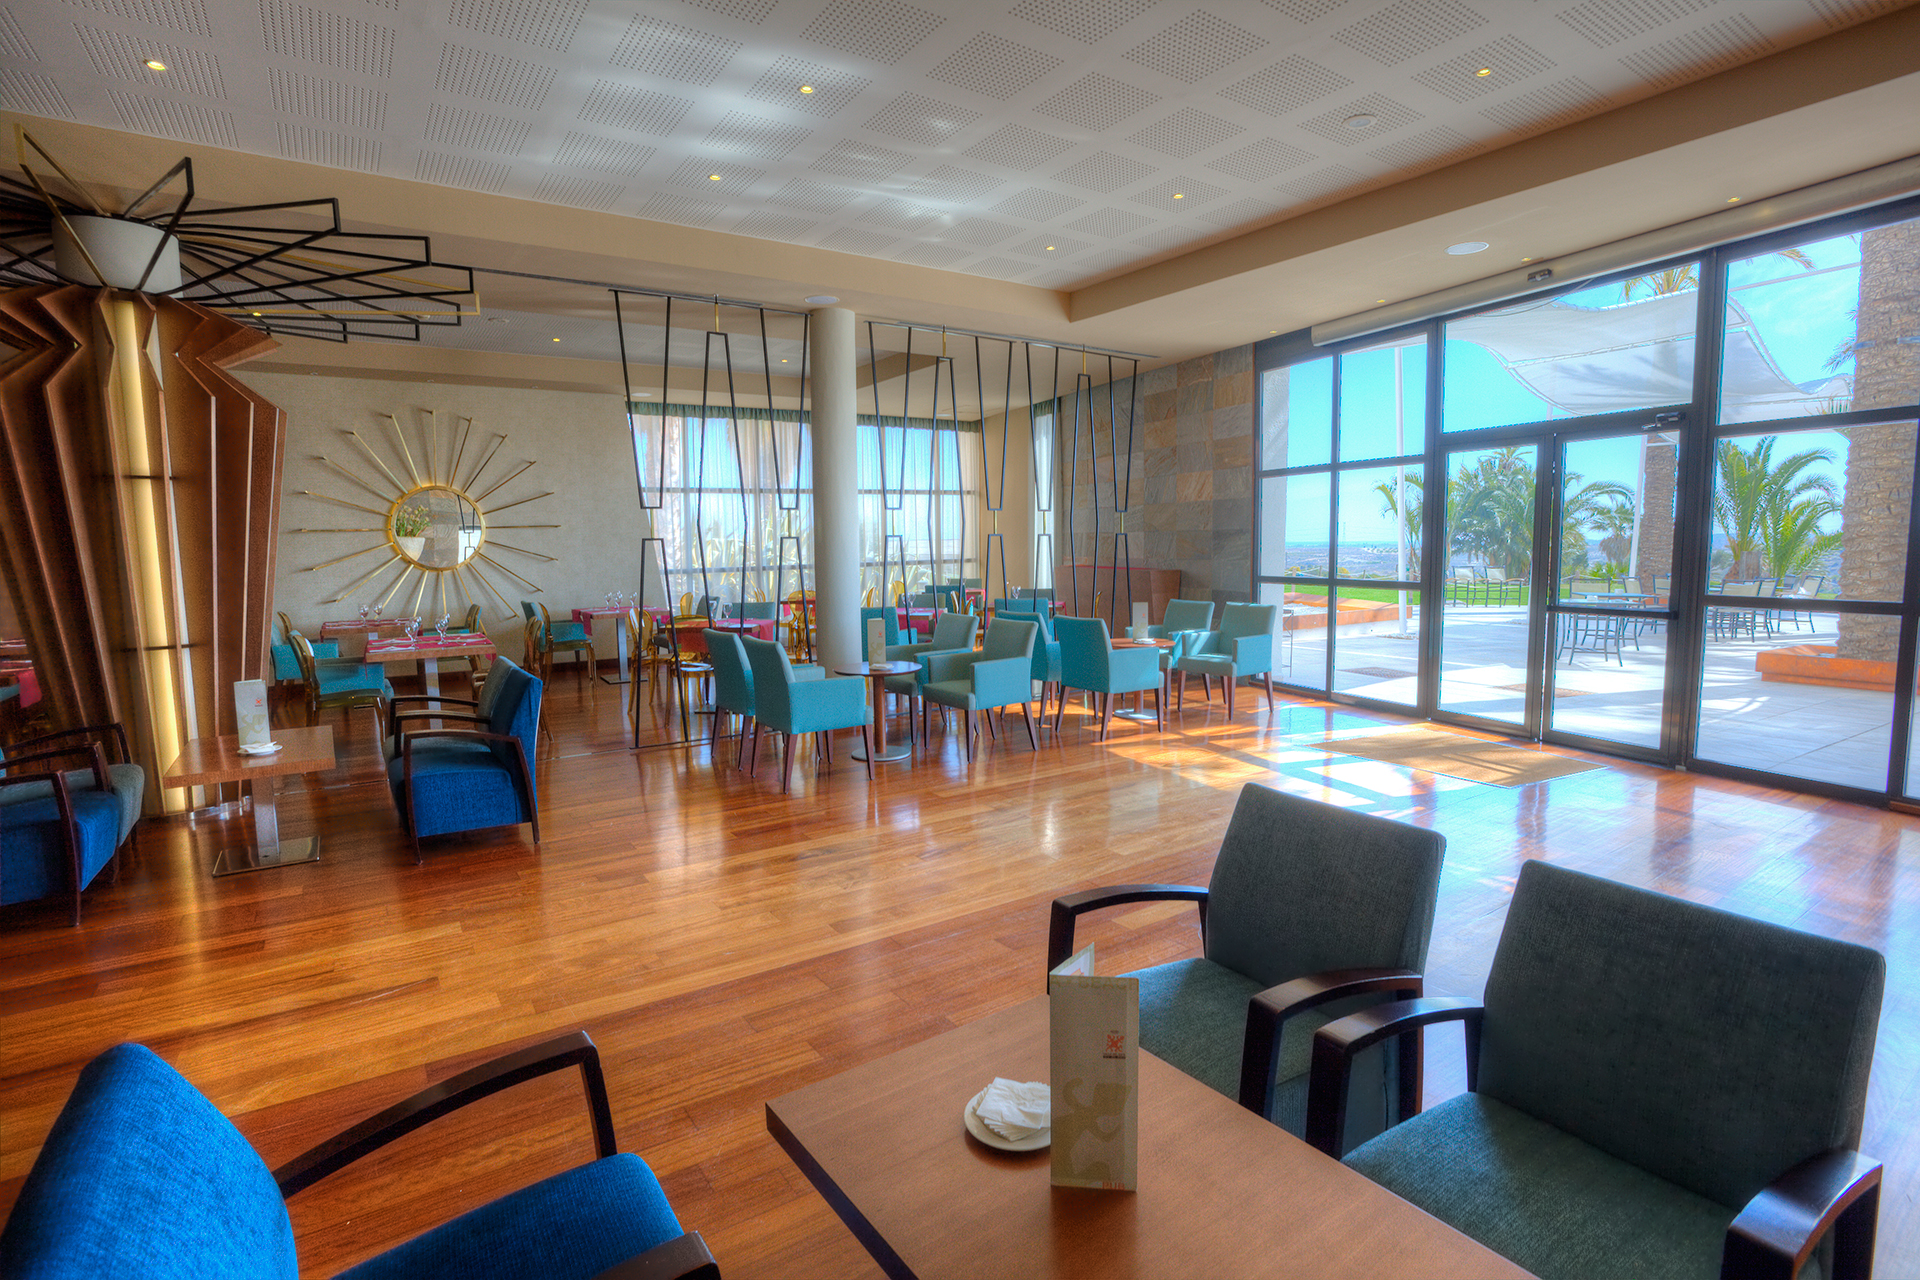 Golf-Expedition-Golf-reizen-Spanje-Regio-Valencia-Valle-Del-este-Golf-resort-Bar-restaurant